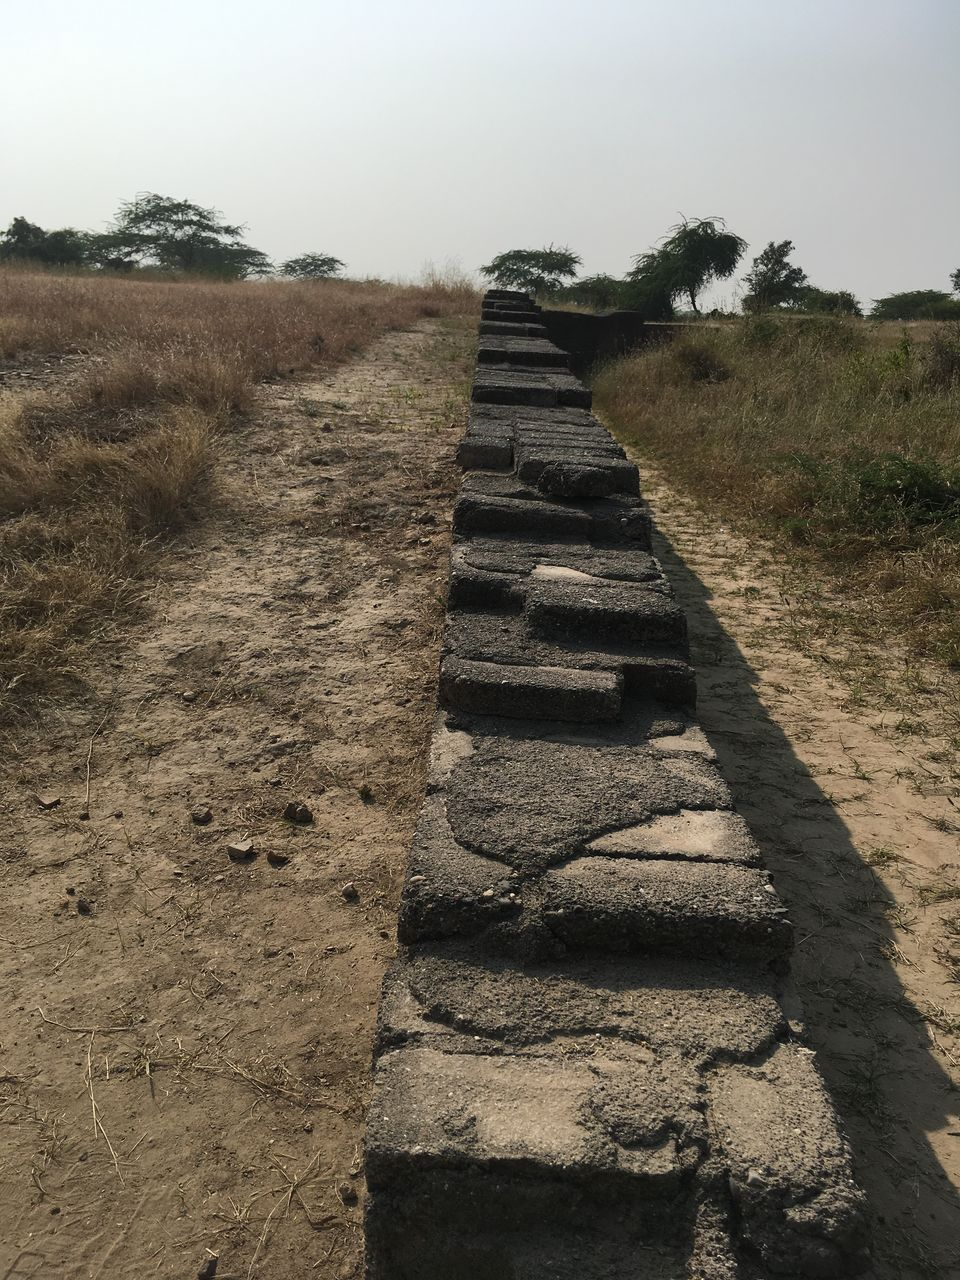 Lothal, Modhera and Adalaj: A 2 Day Trip in Gujarat